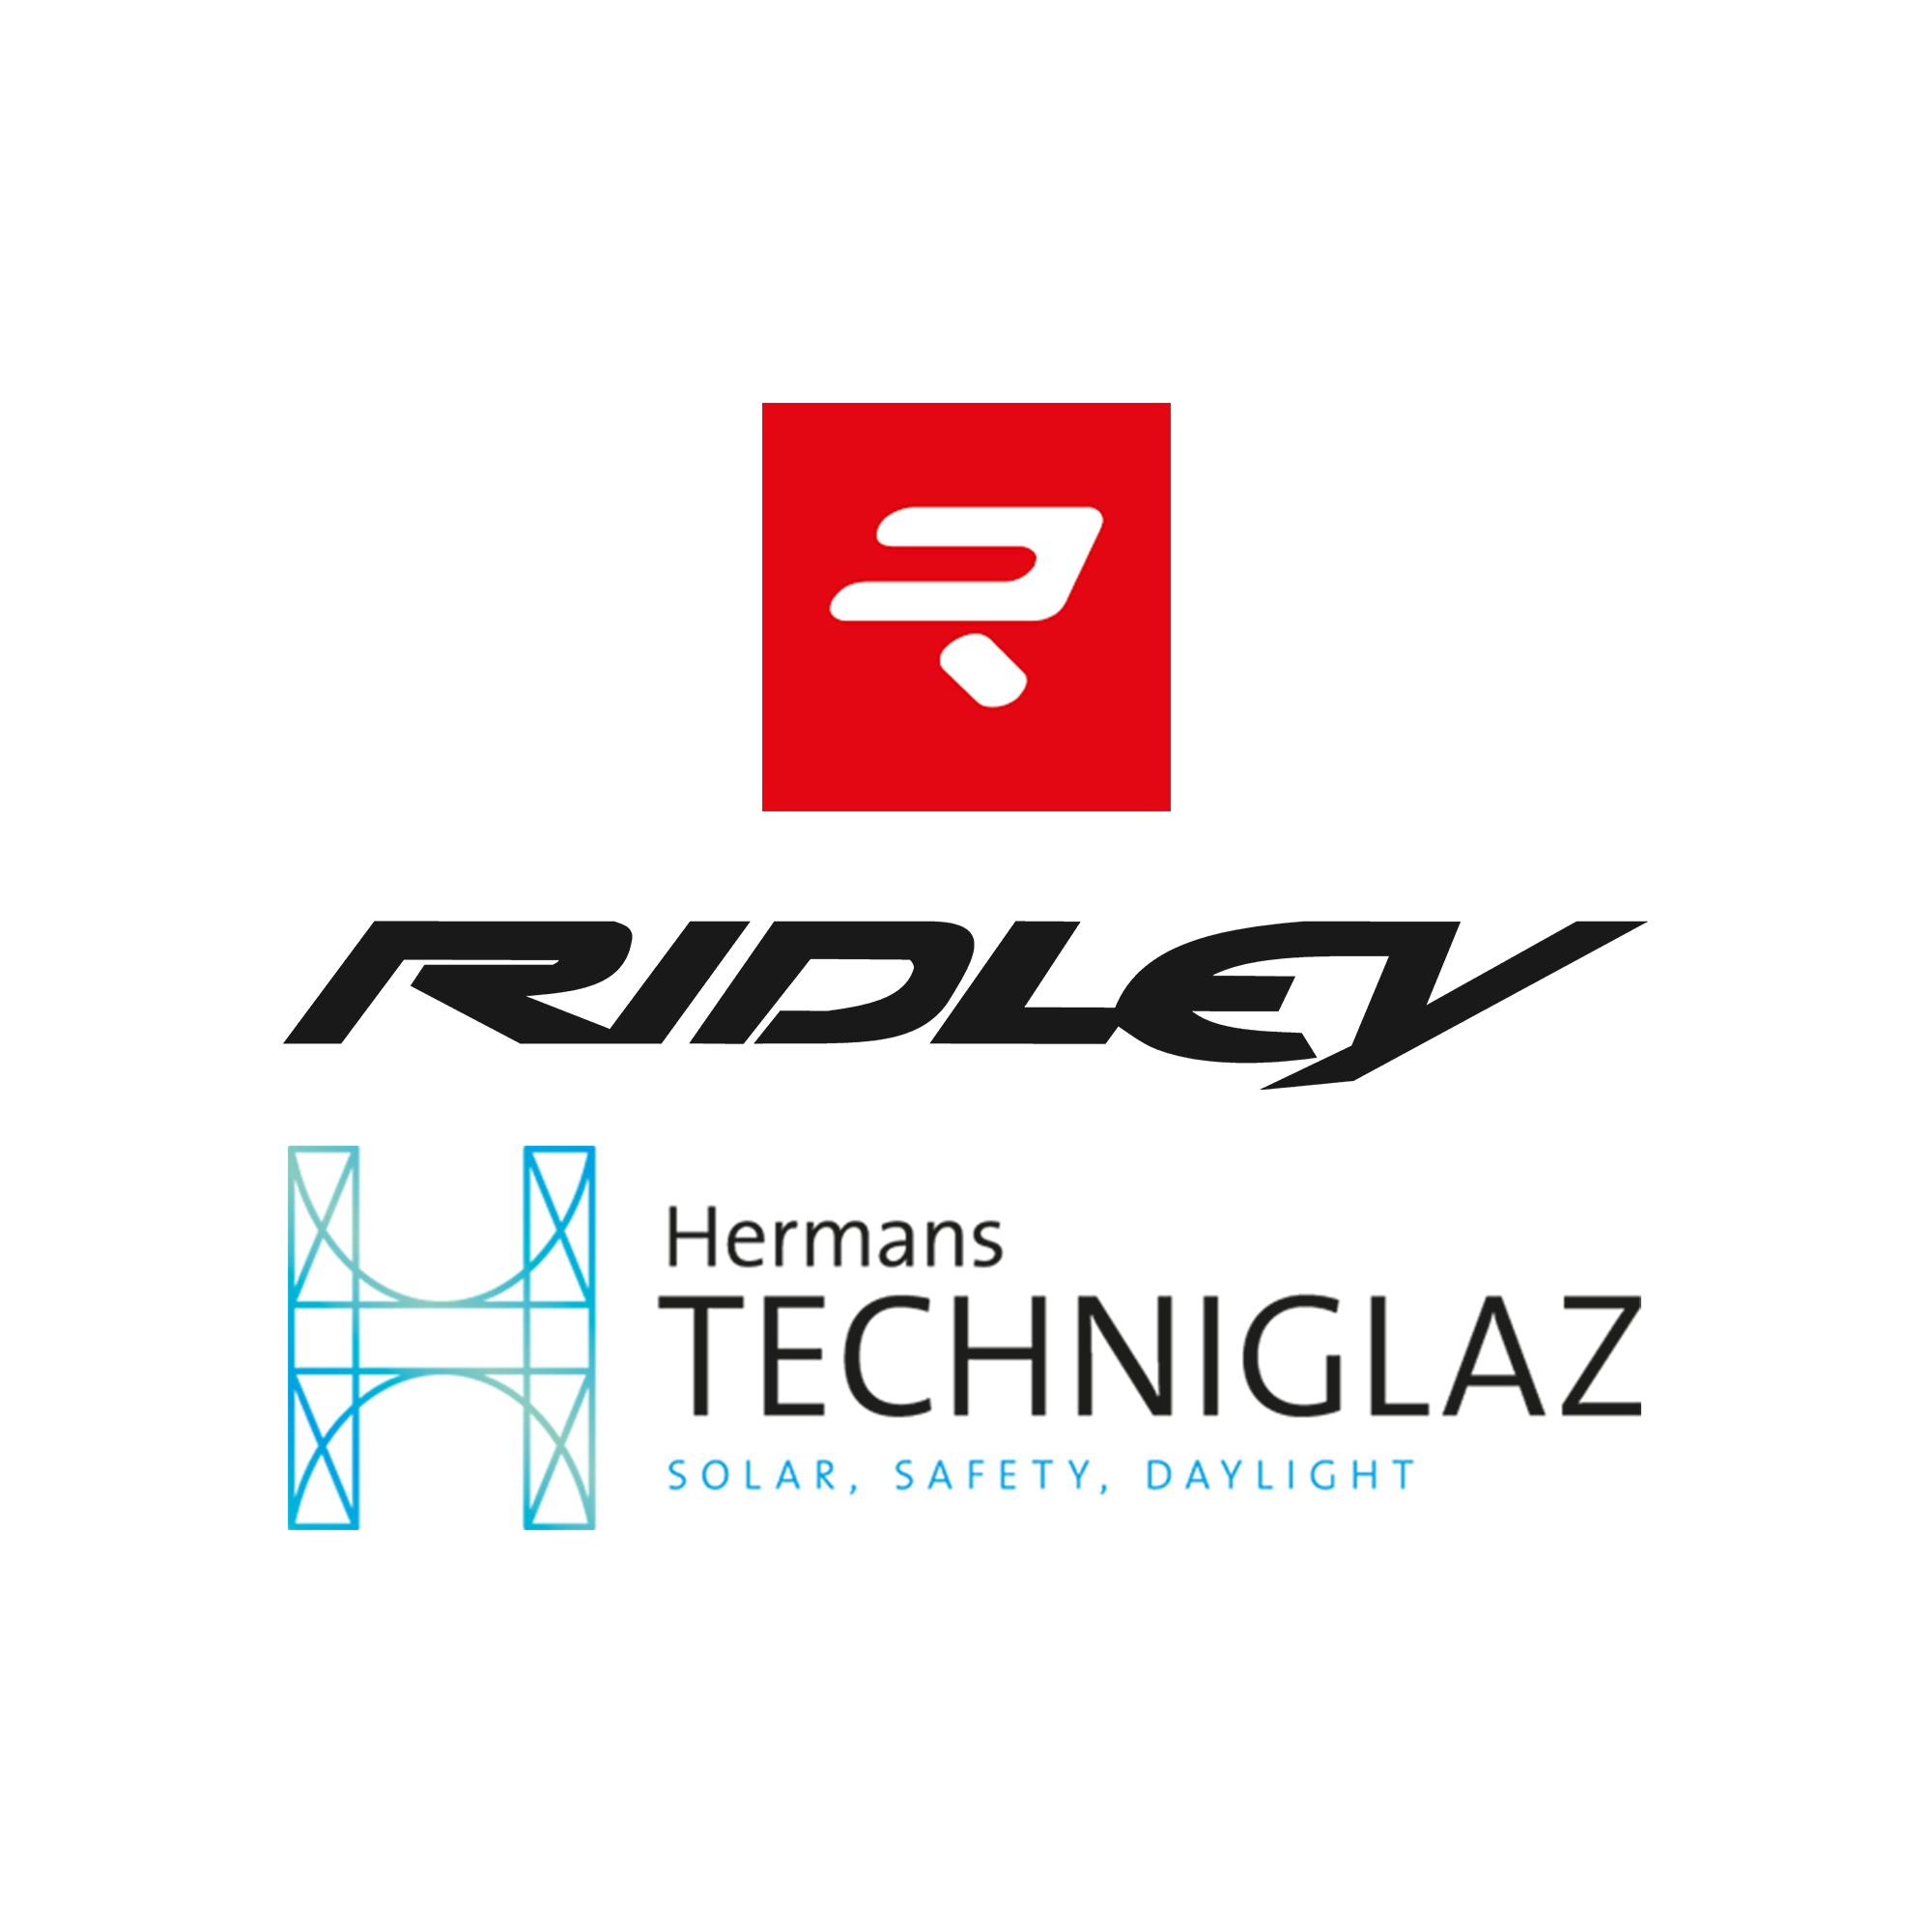 Logo Ridley-Hermans